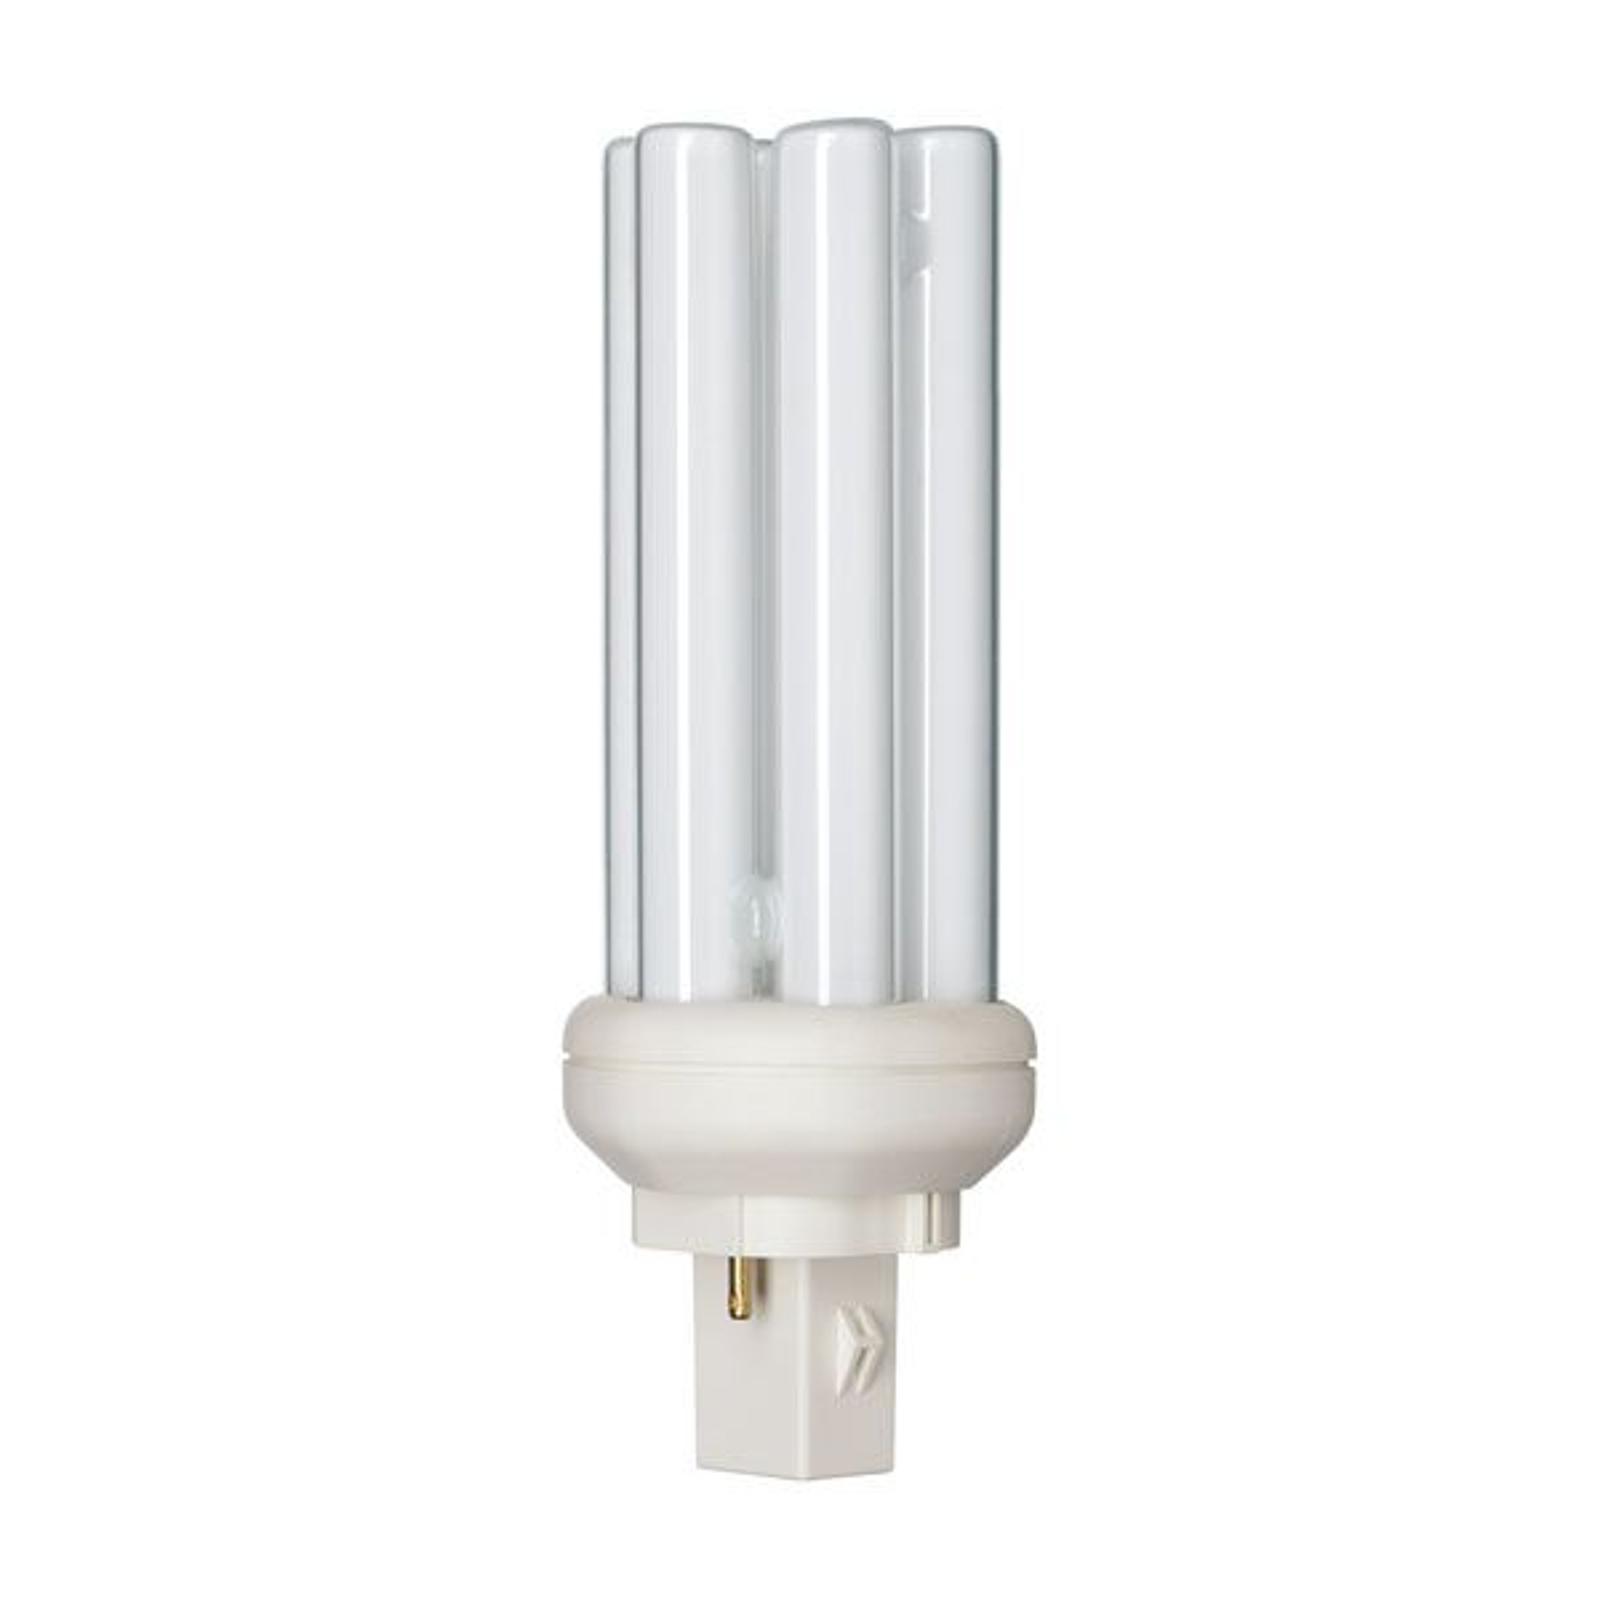 GX24d Kompaktleuchtstofflampe Master 26W PL-T 827